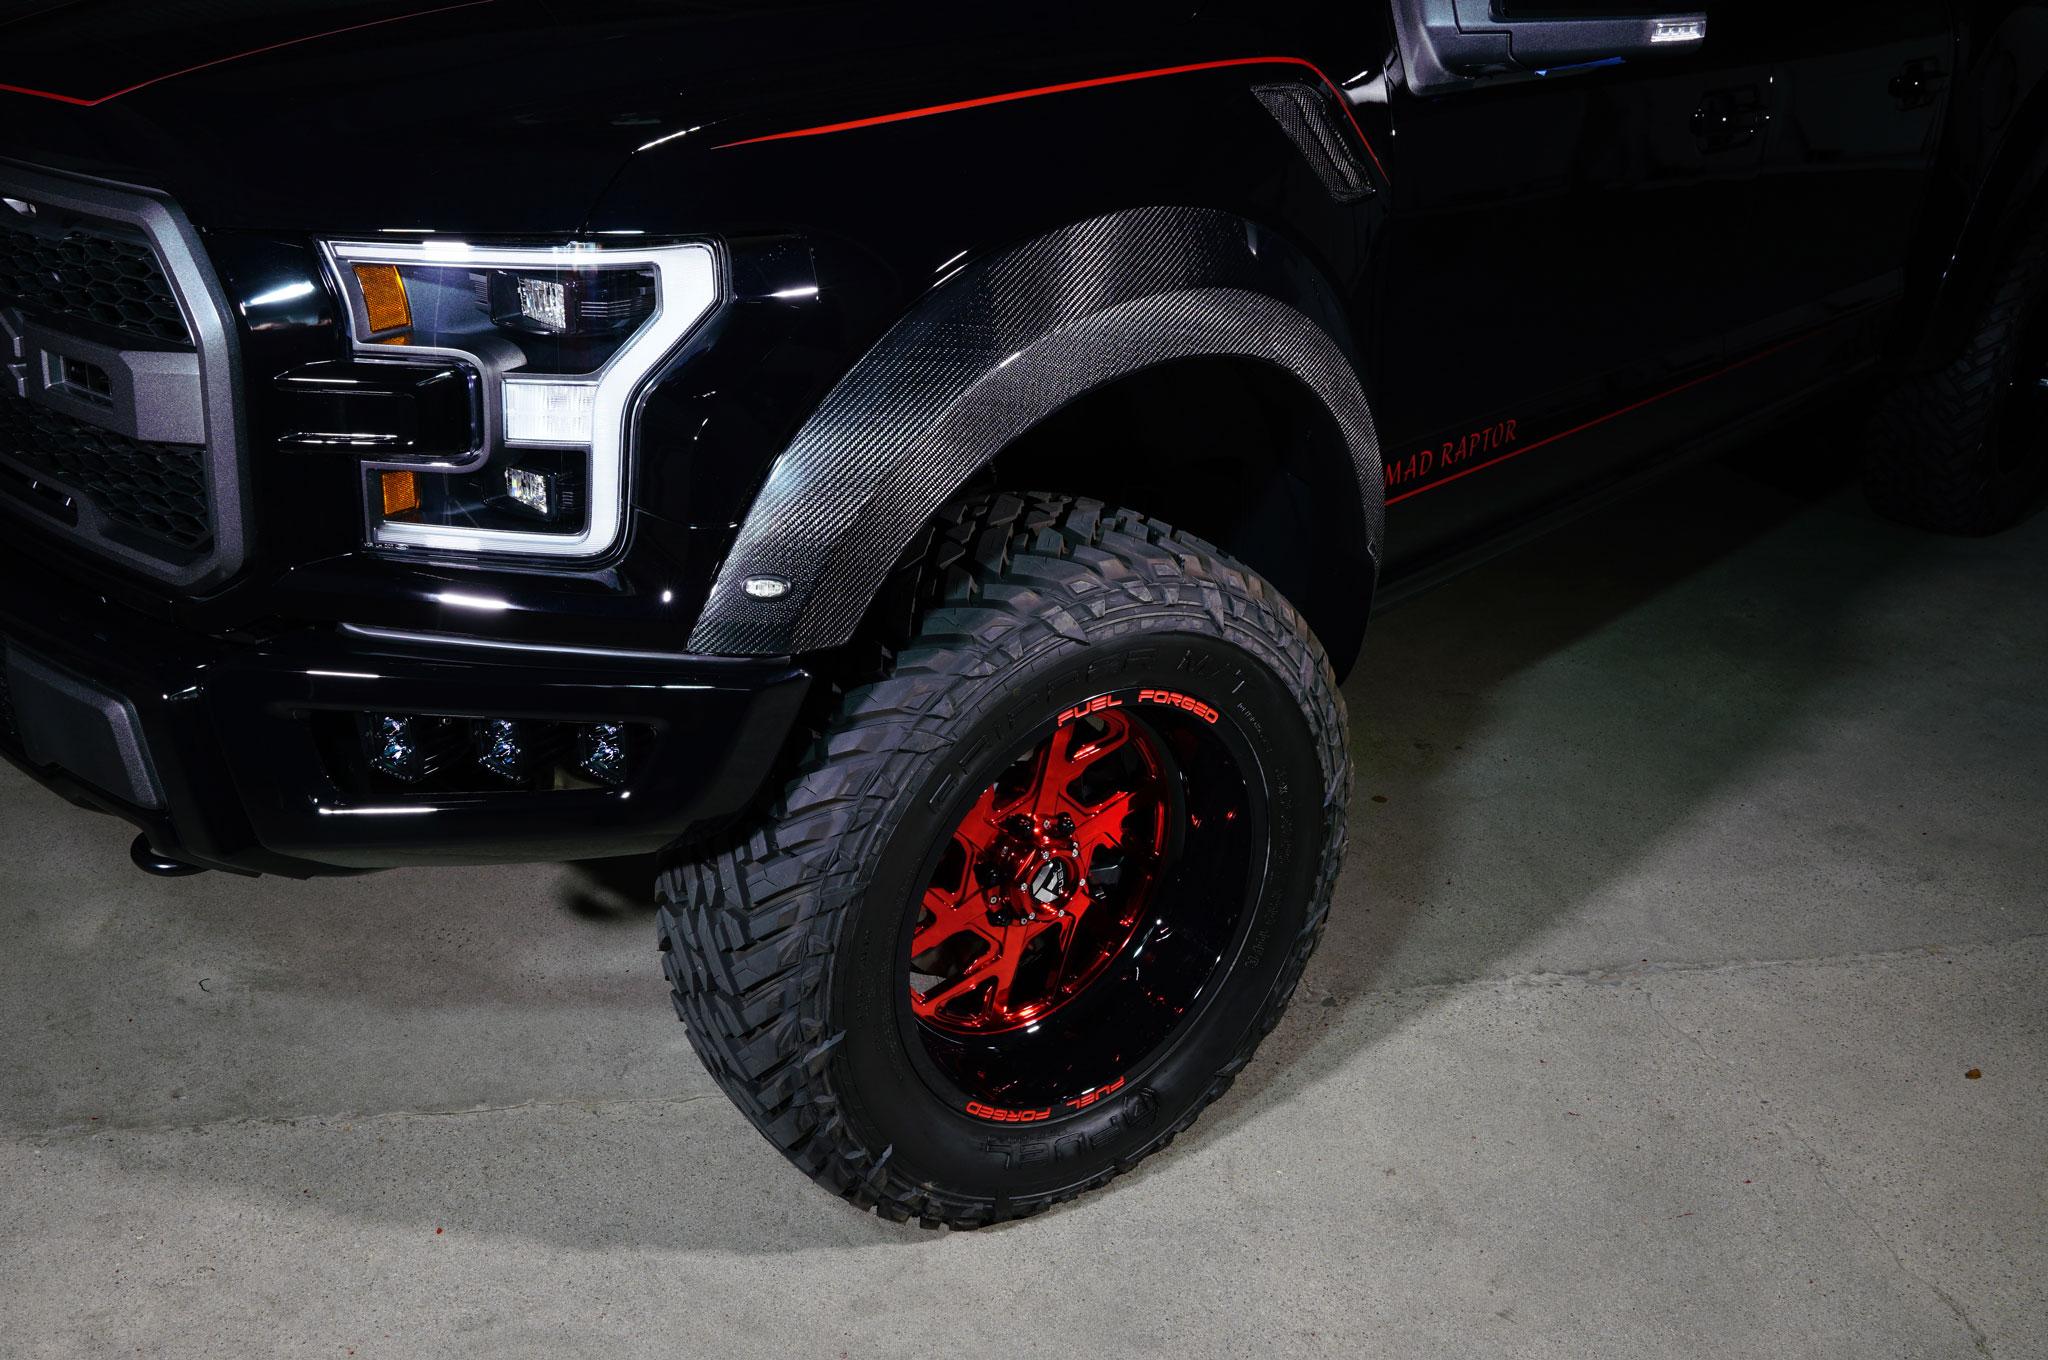 2018 Ford F 150 Raptor MAD Industries Black front fender wheel